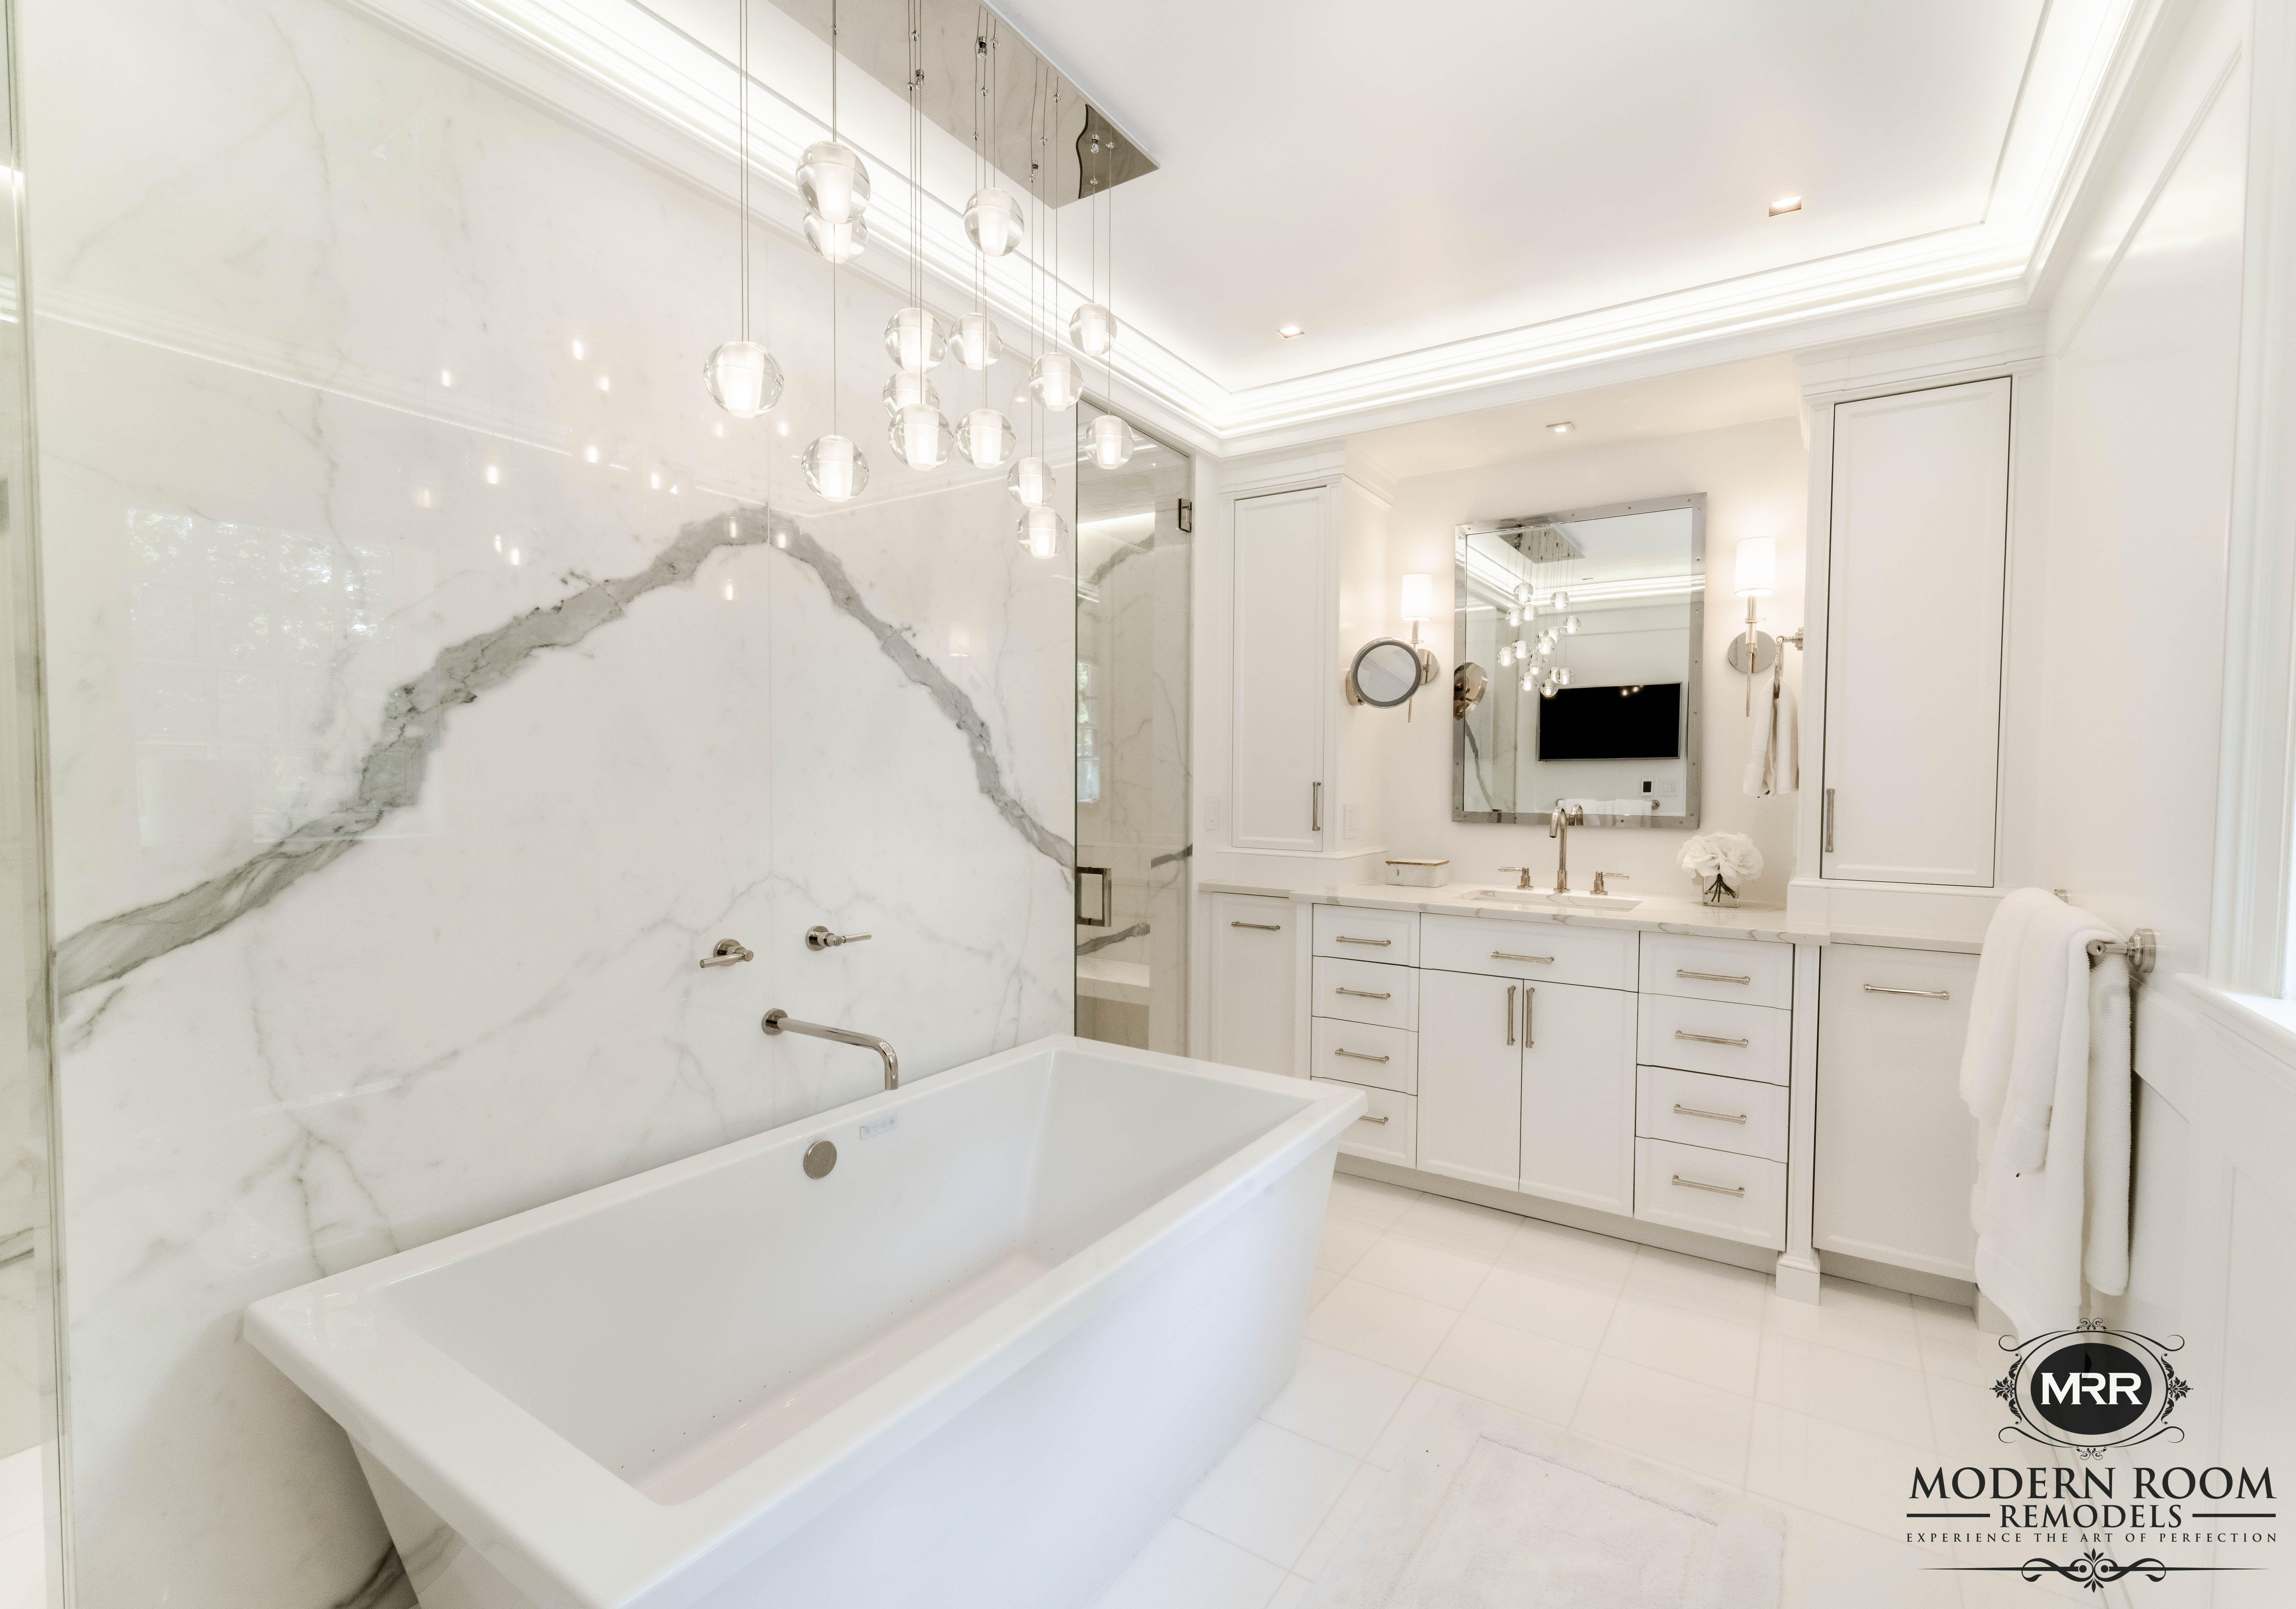 Porcelanosa Xlight Kala White for a MasterBath Suite  Gauged